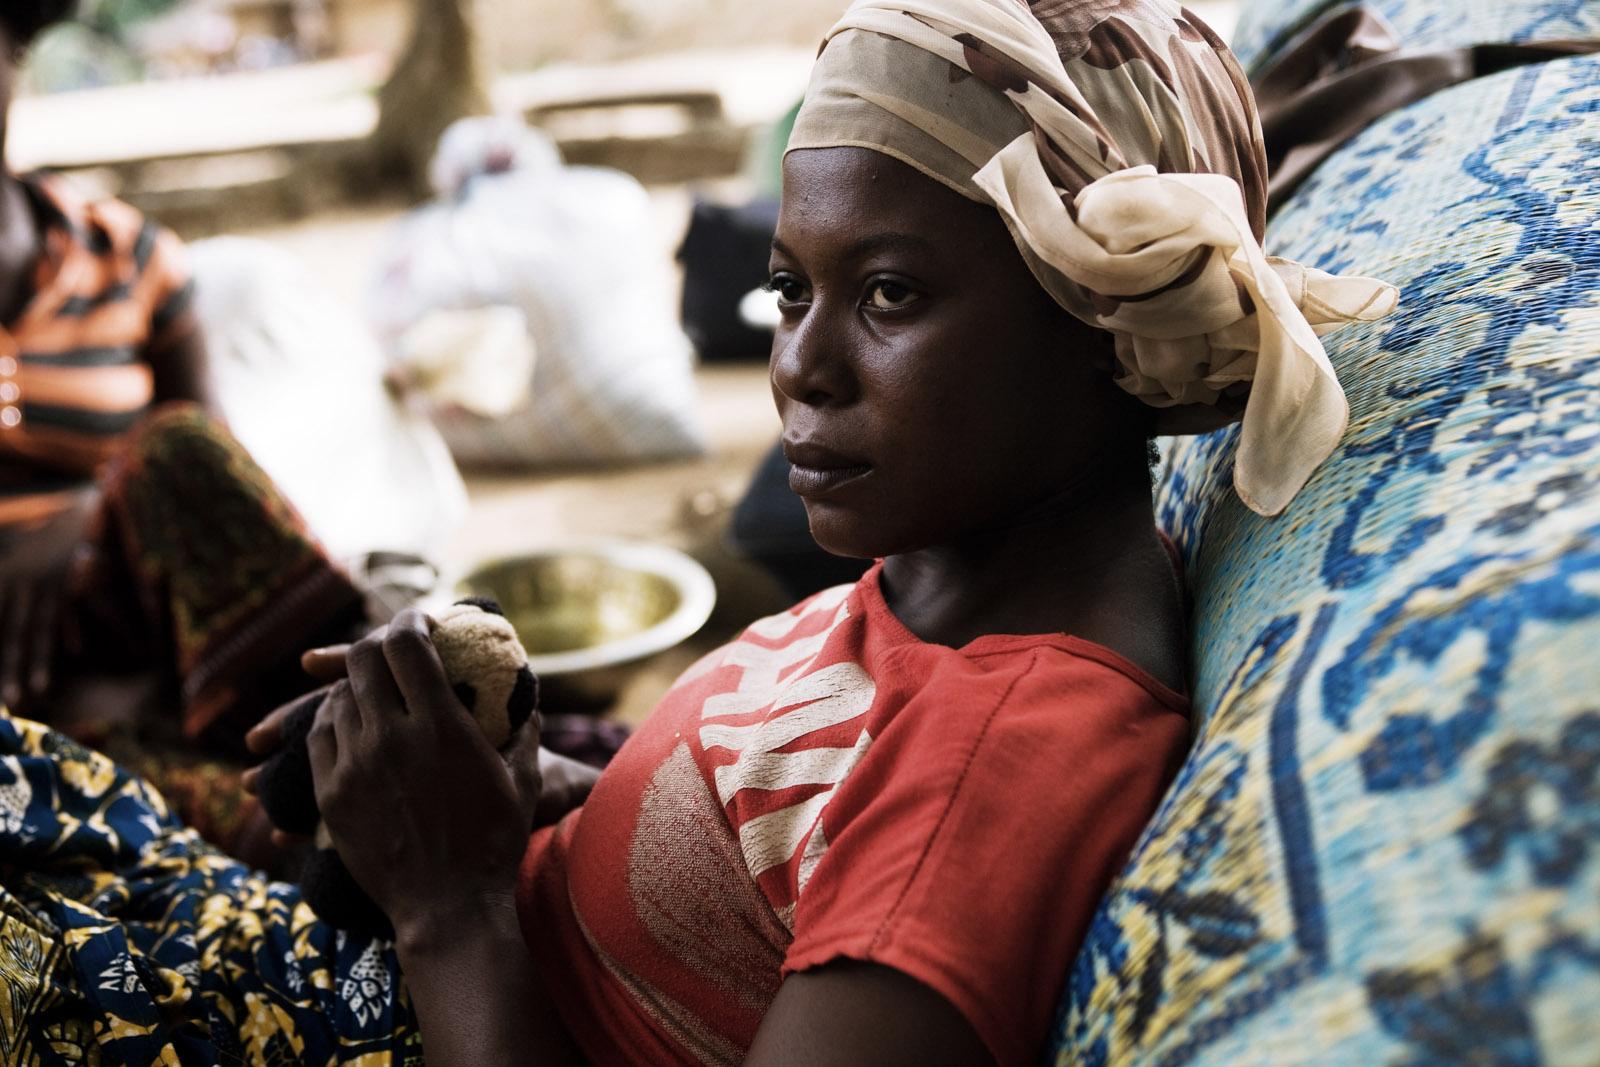 liberia-refugies-ivoiriens-0311-0508hd